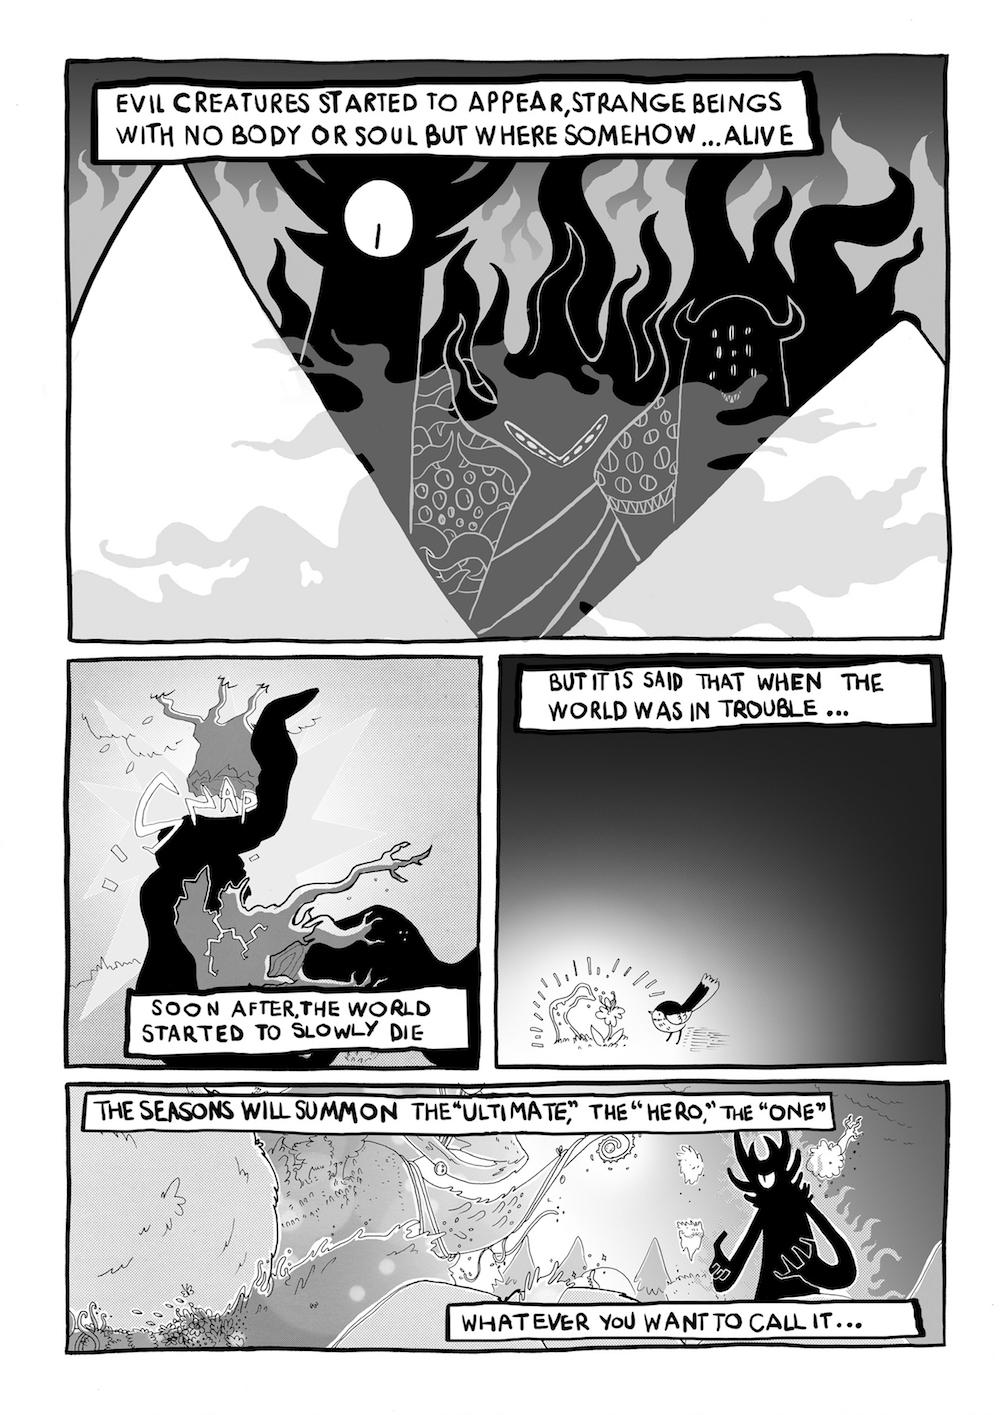 herald owlett vol 1 page 3 copy.jpg